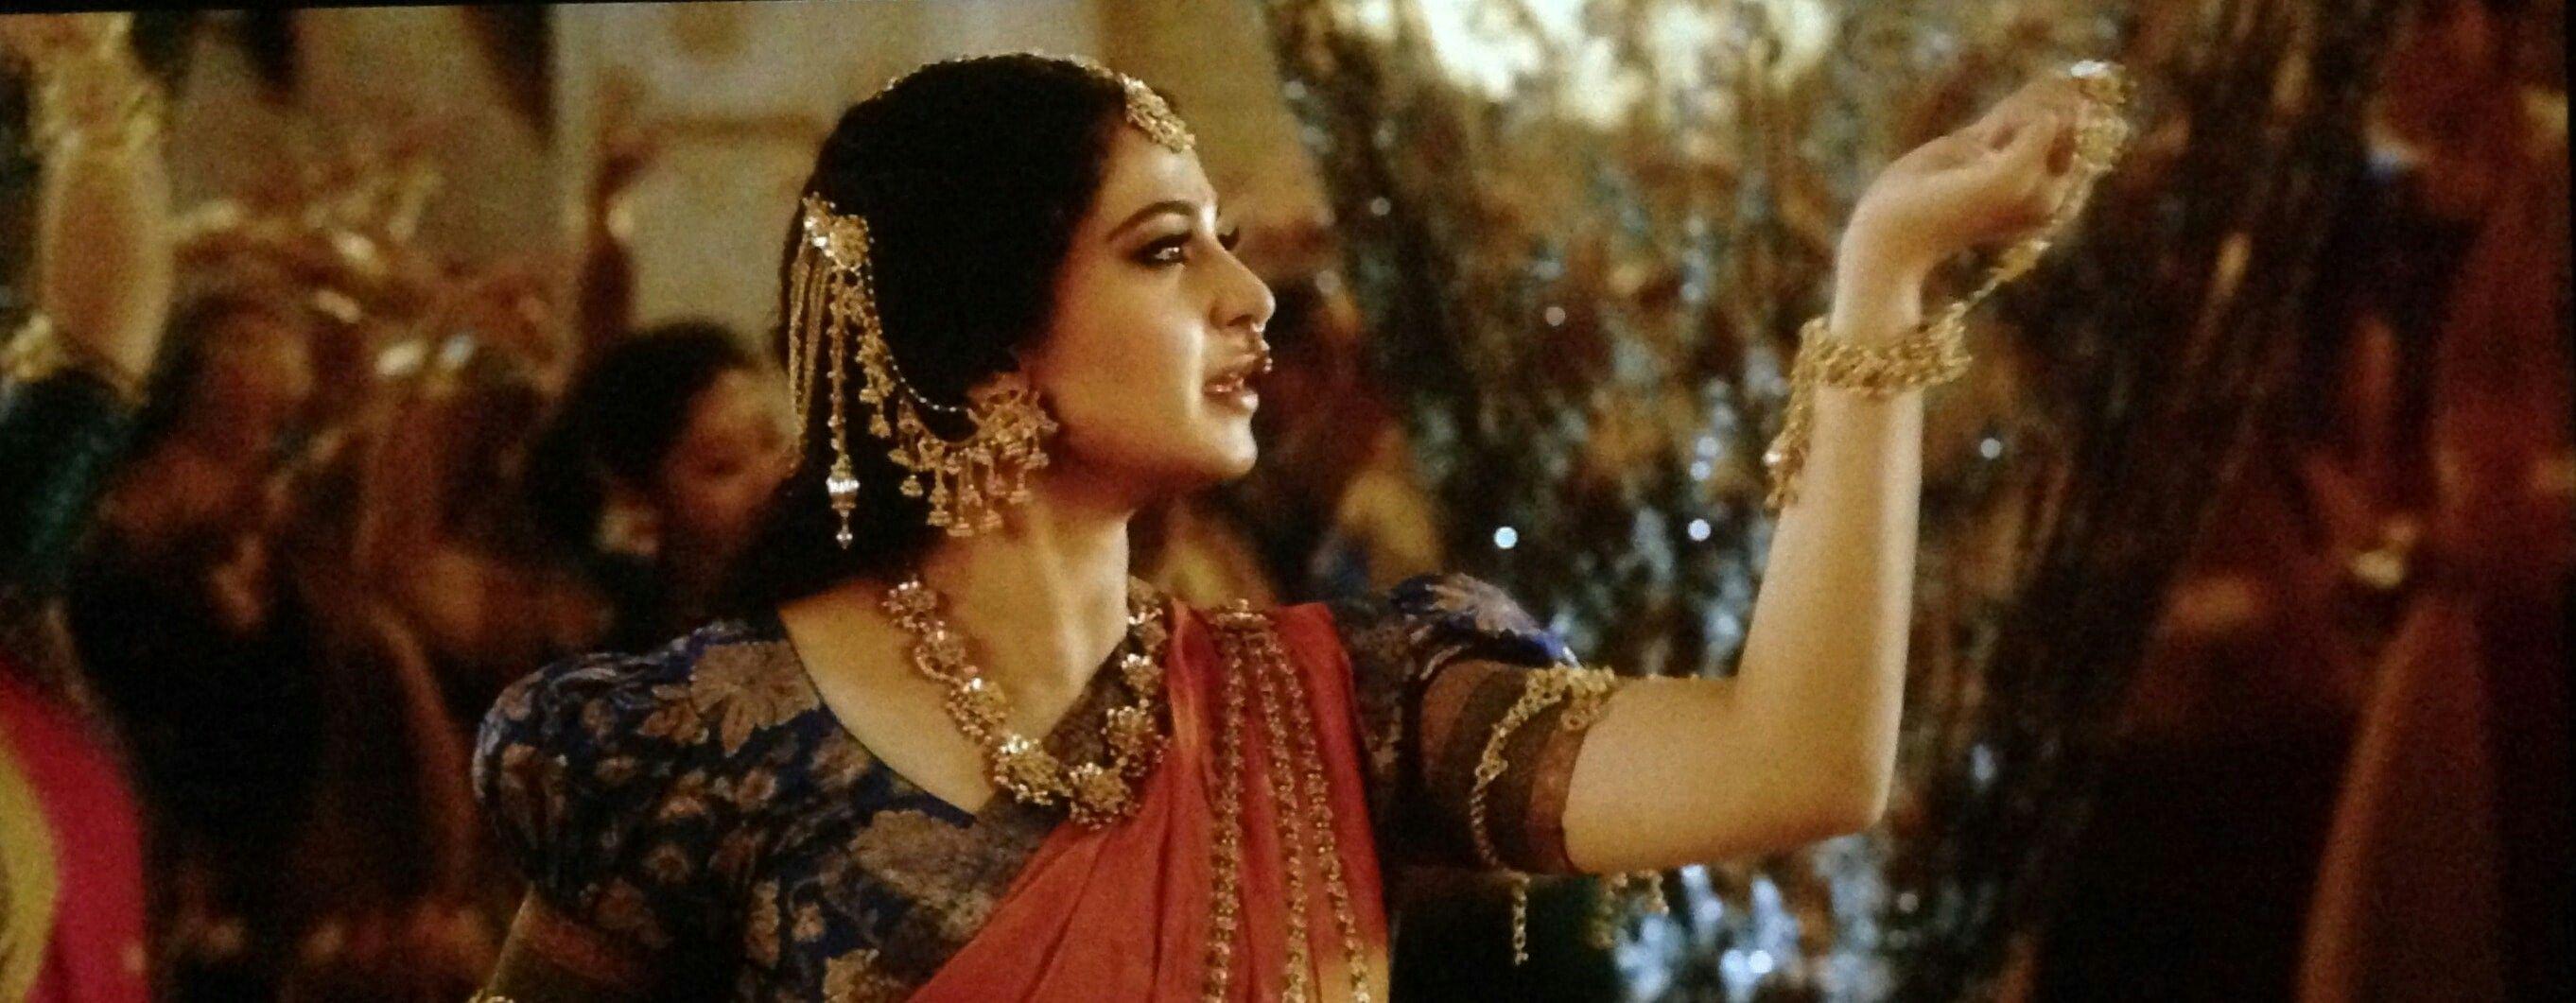 Pin By Shiti Habib On Blockbuster Bahubali Bahubali 2 Prabhas And Anushka Anushka Shetty Bahubali